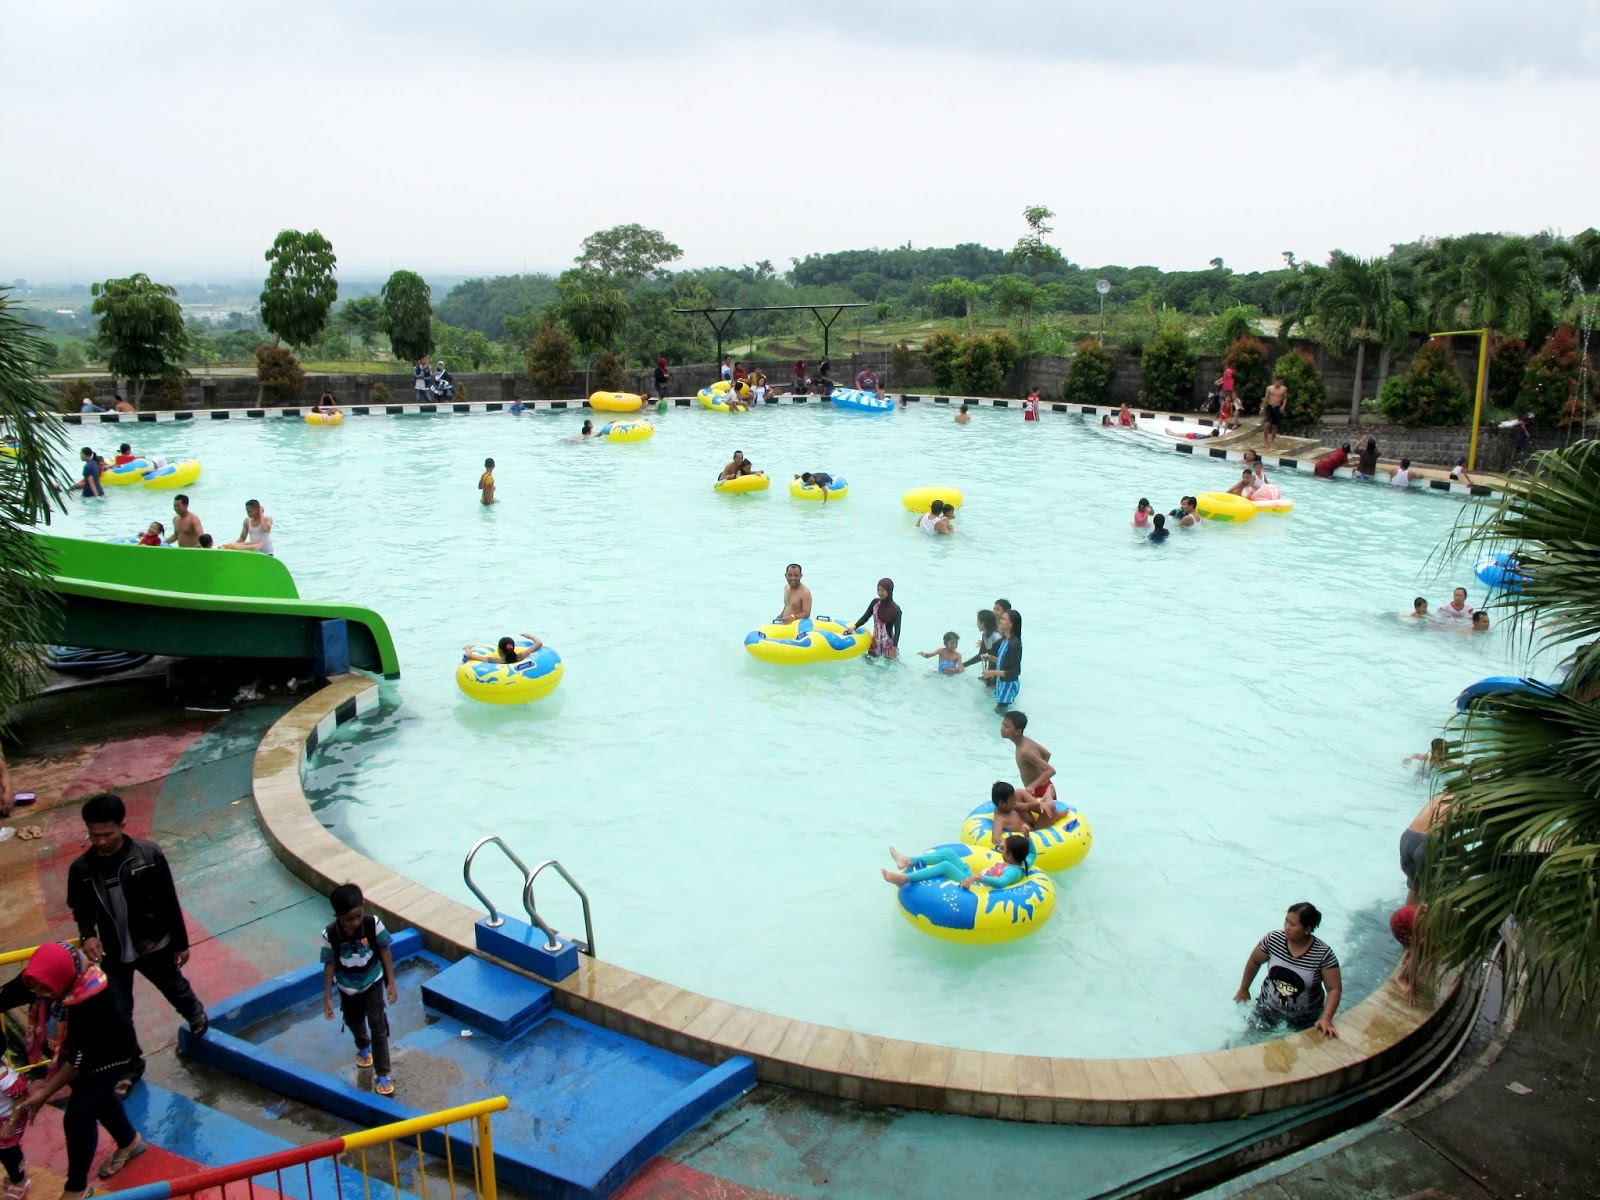 Wisata Joglo Park Pacet Haya Zone View Kolam Renang Dewasa